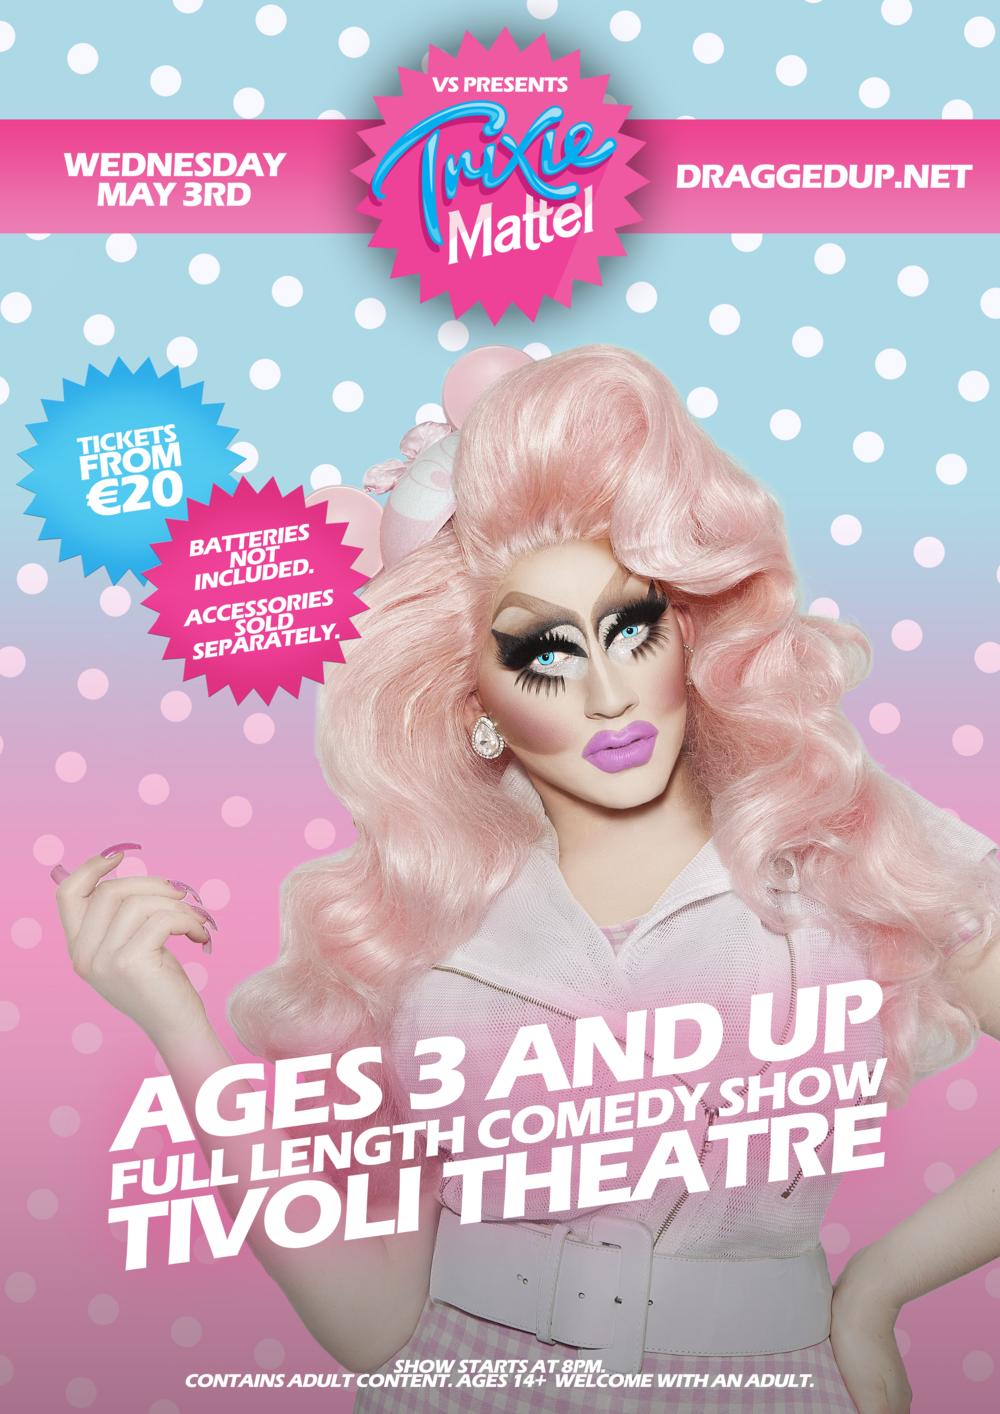 Trixie Mattel - Poster - Final.png